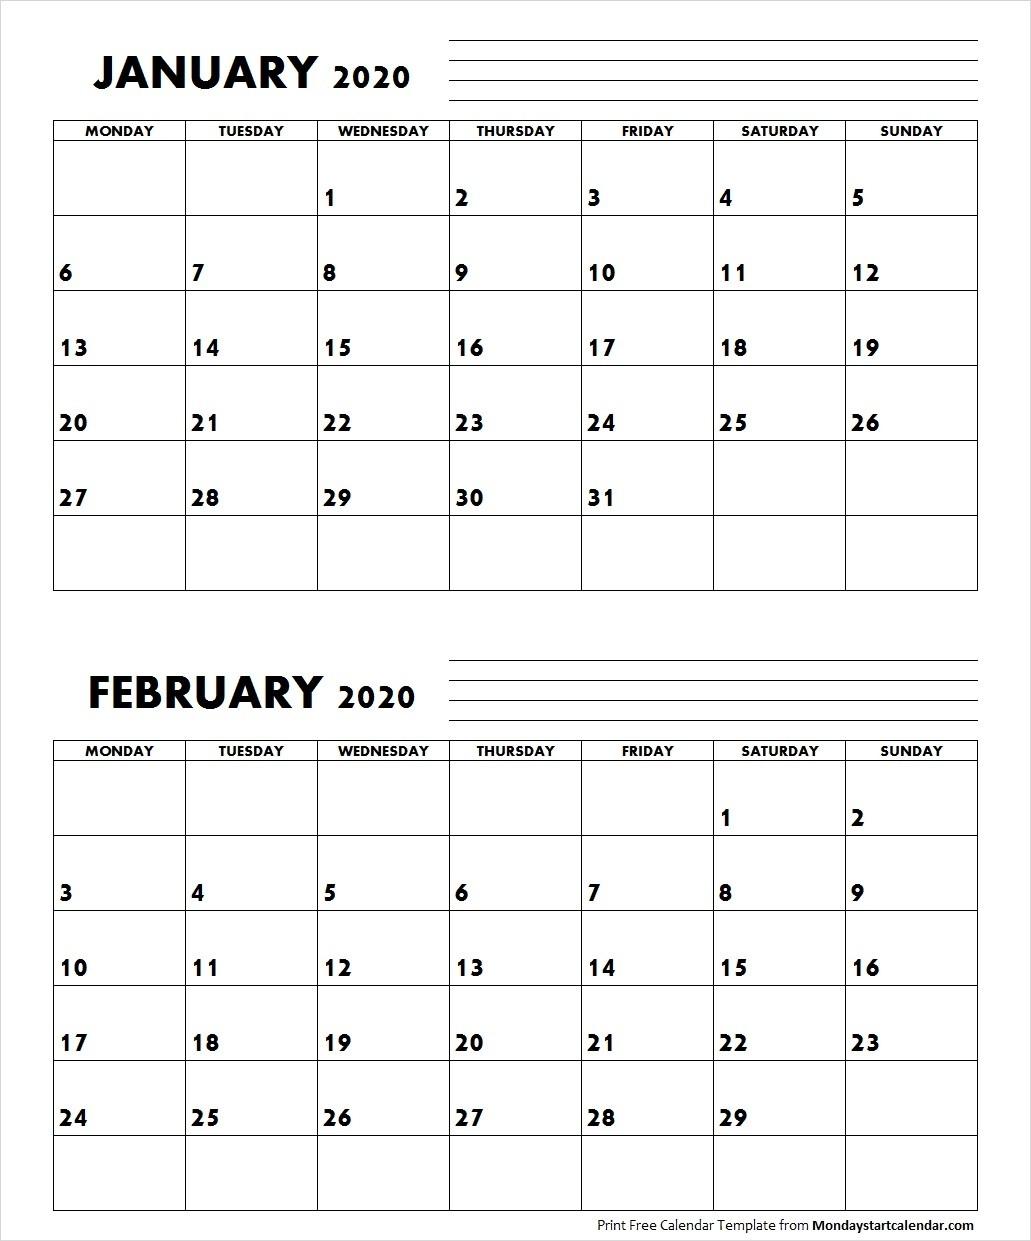 Jan Feb 2020 Calendar Monday Start | Editable Two Months-January And February 2020 Calendar